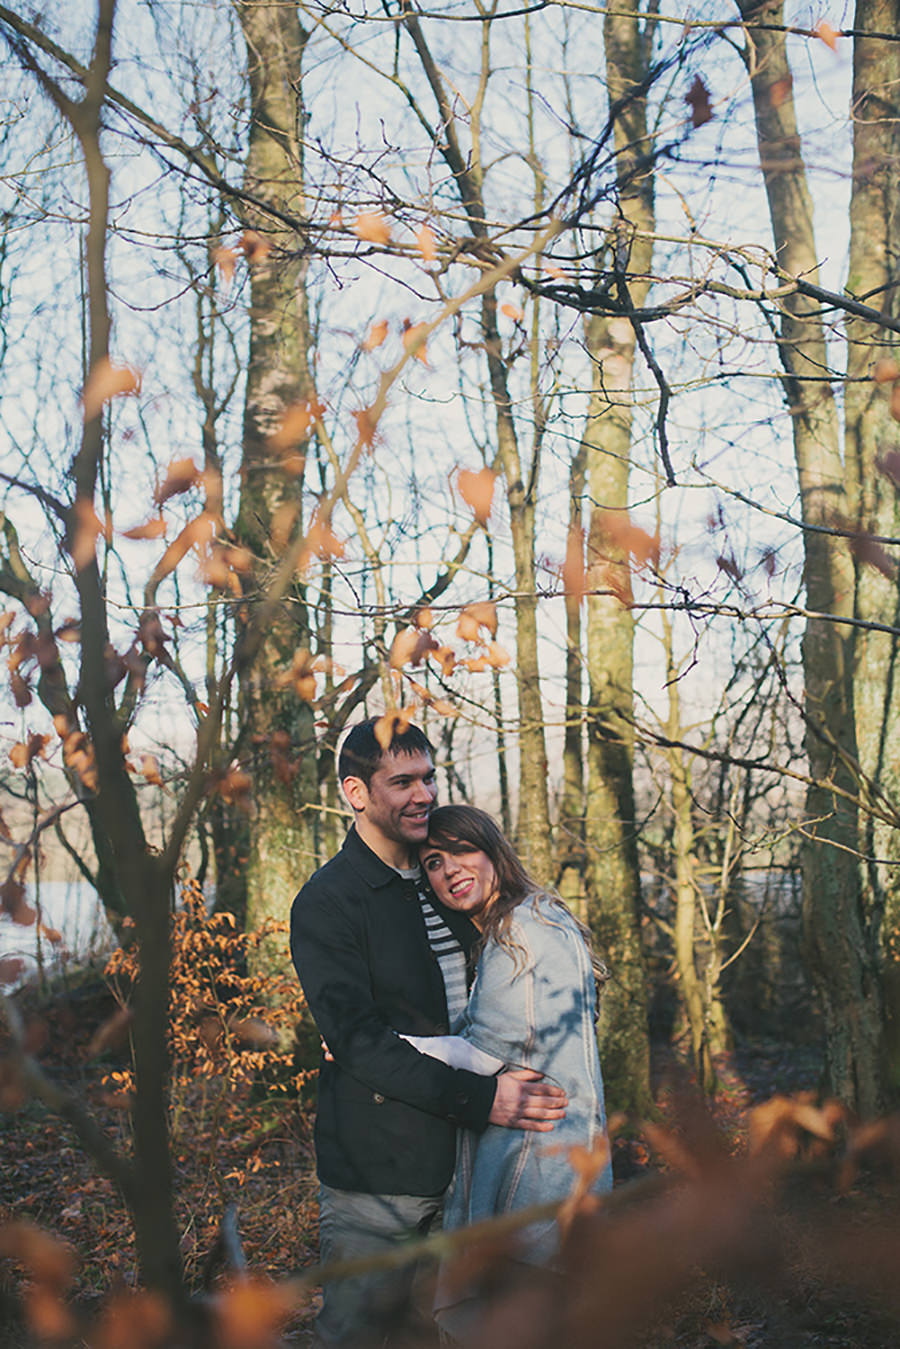 artistic_engagement_pre-wedding_photography_glasgow_scotland13-